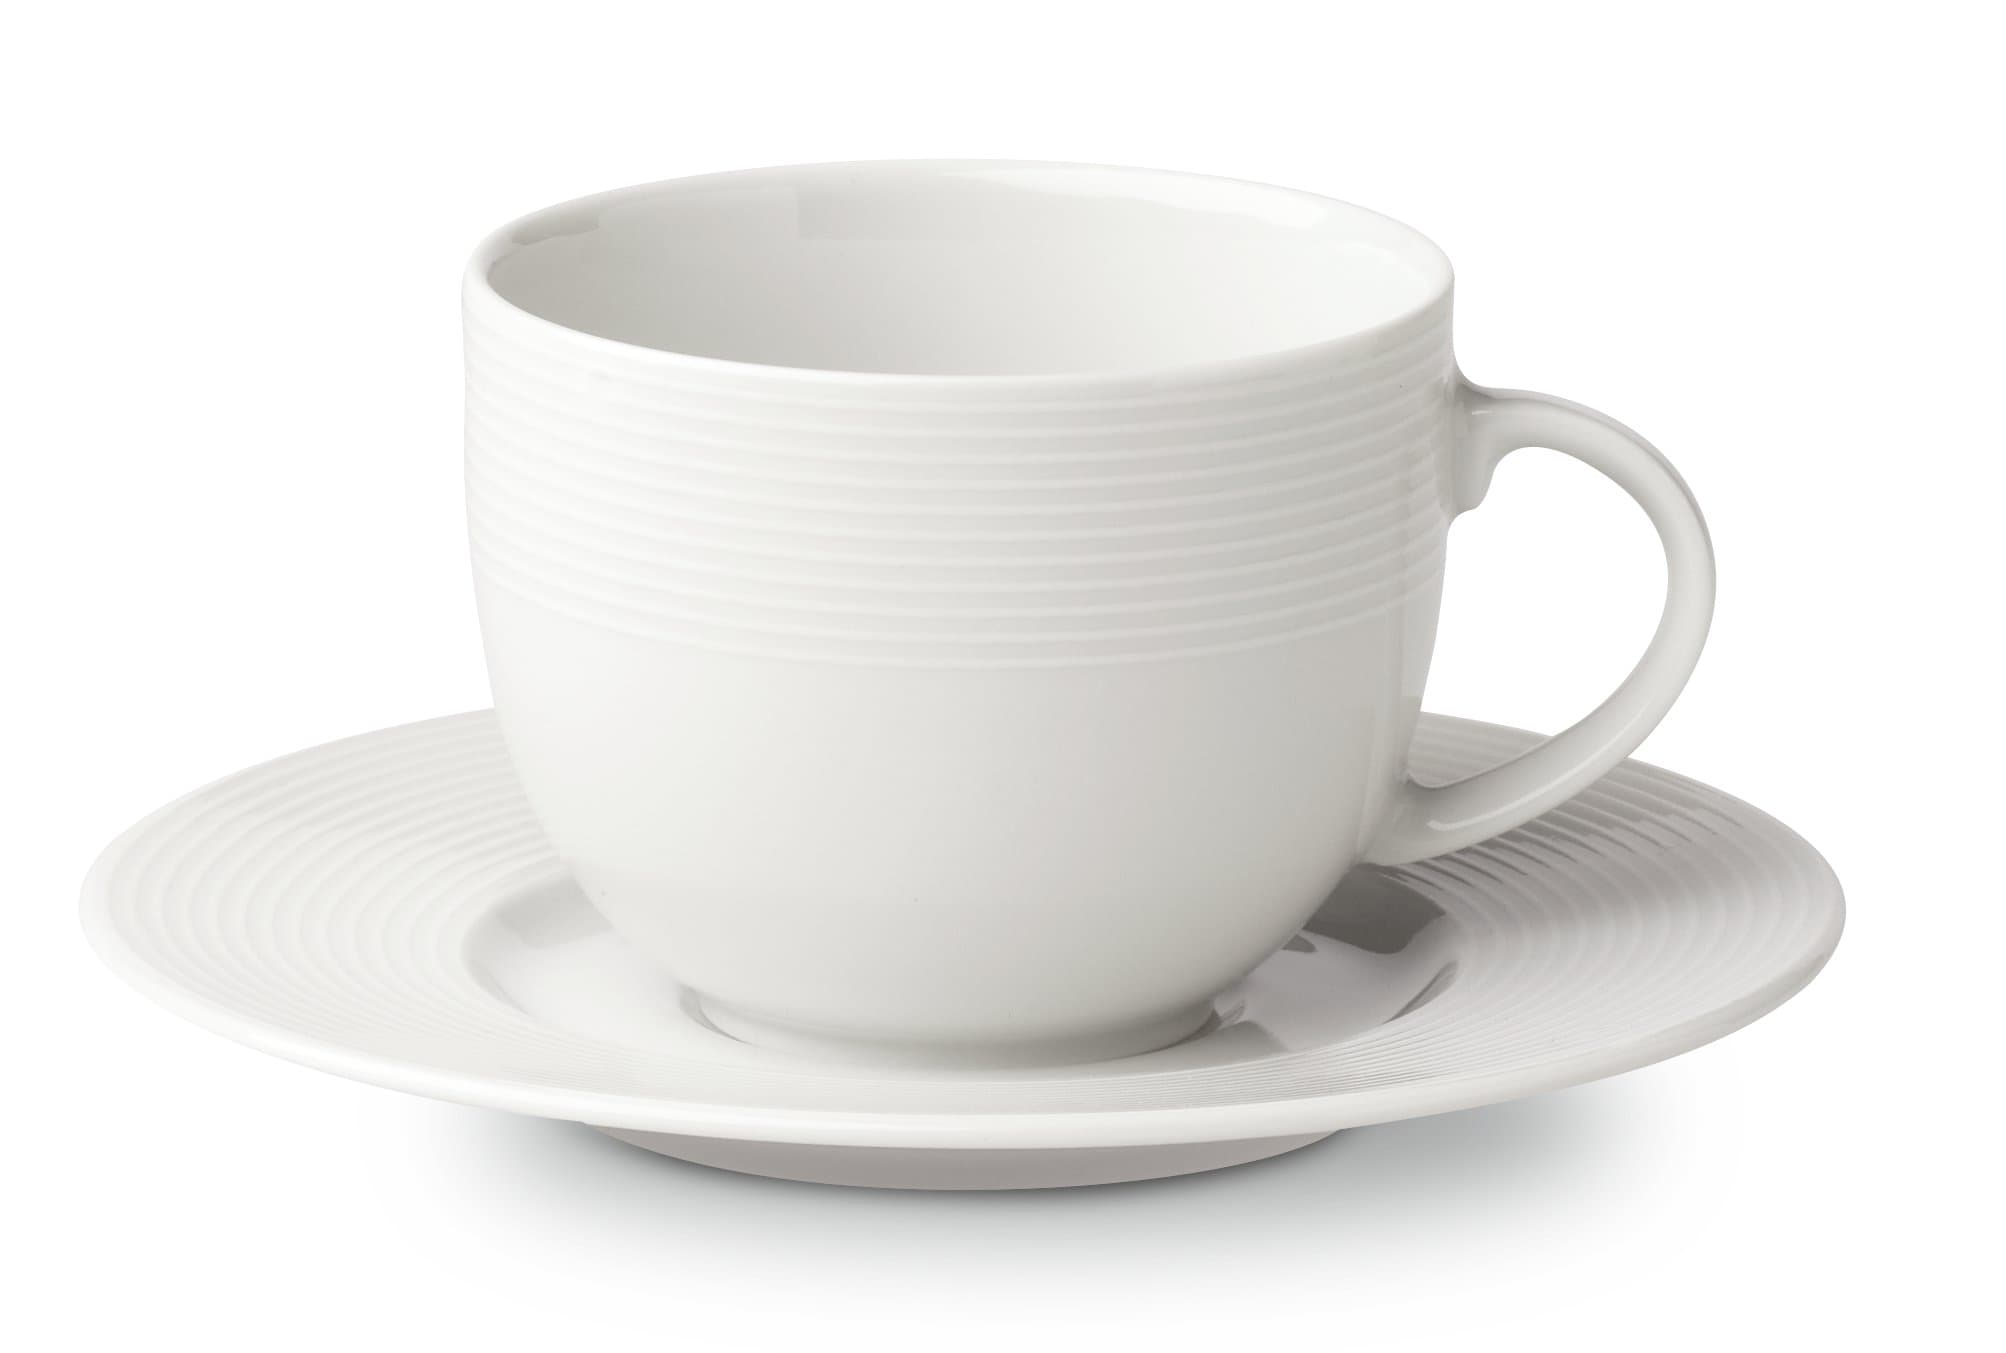 Cucina & Tavola VIENNA Tasse à café avec sous-tasse